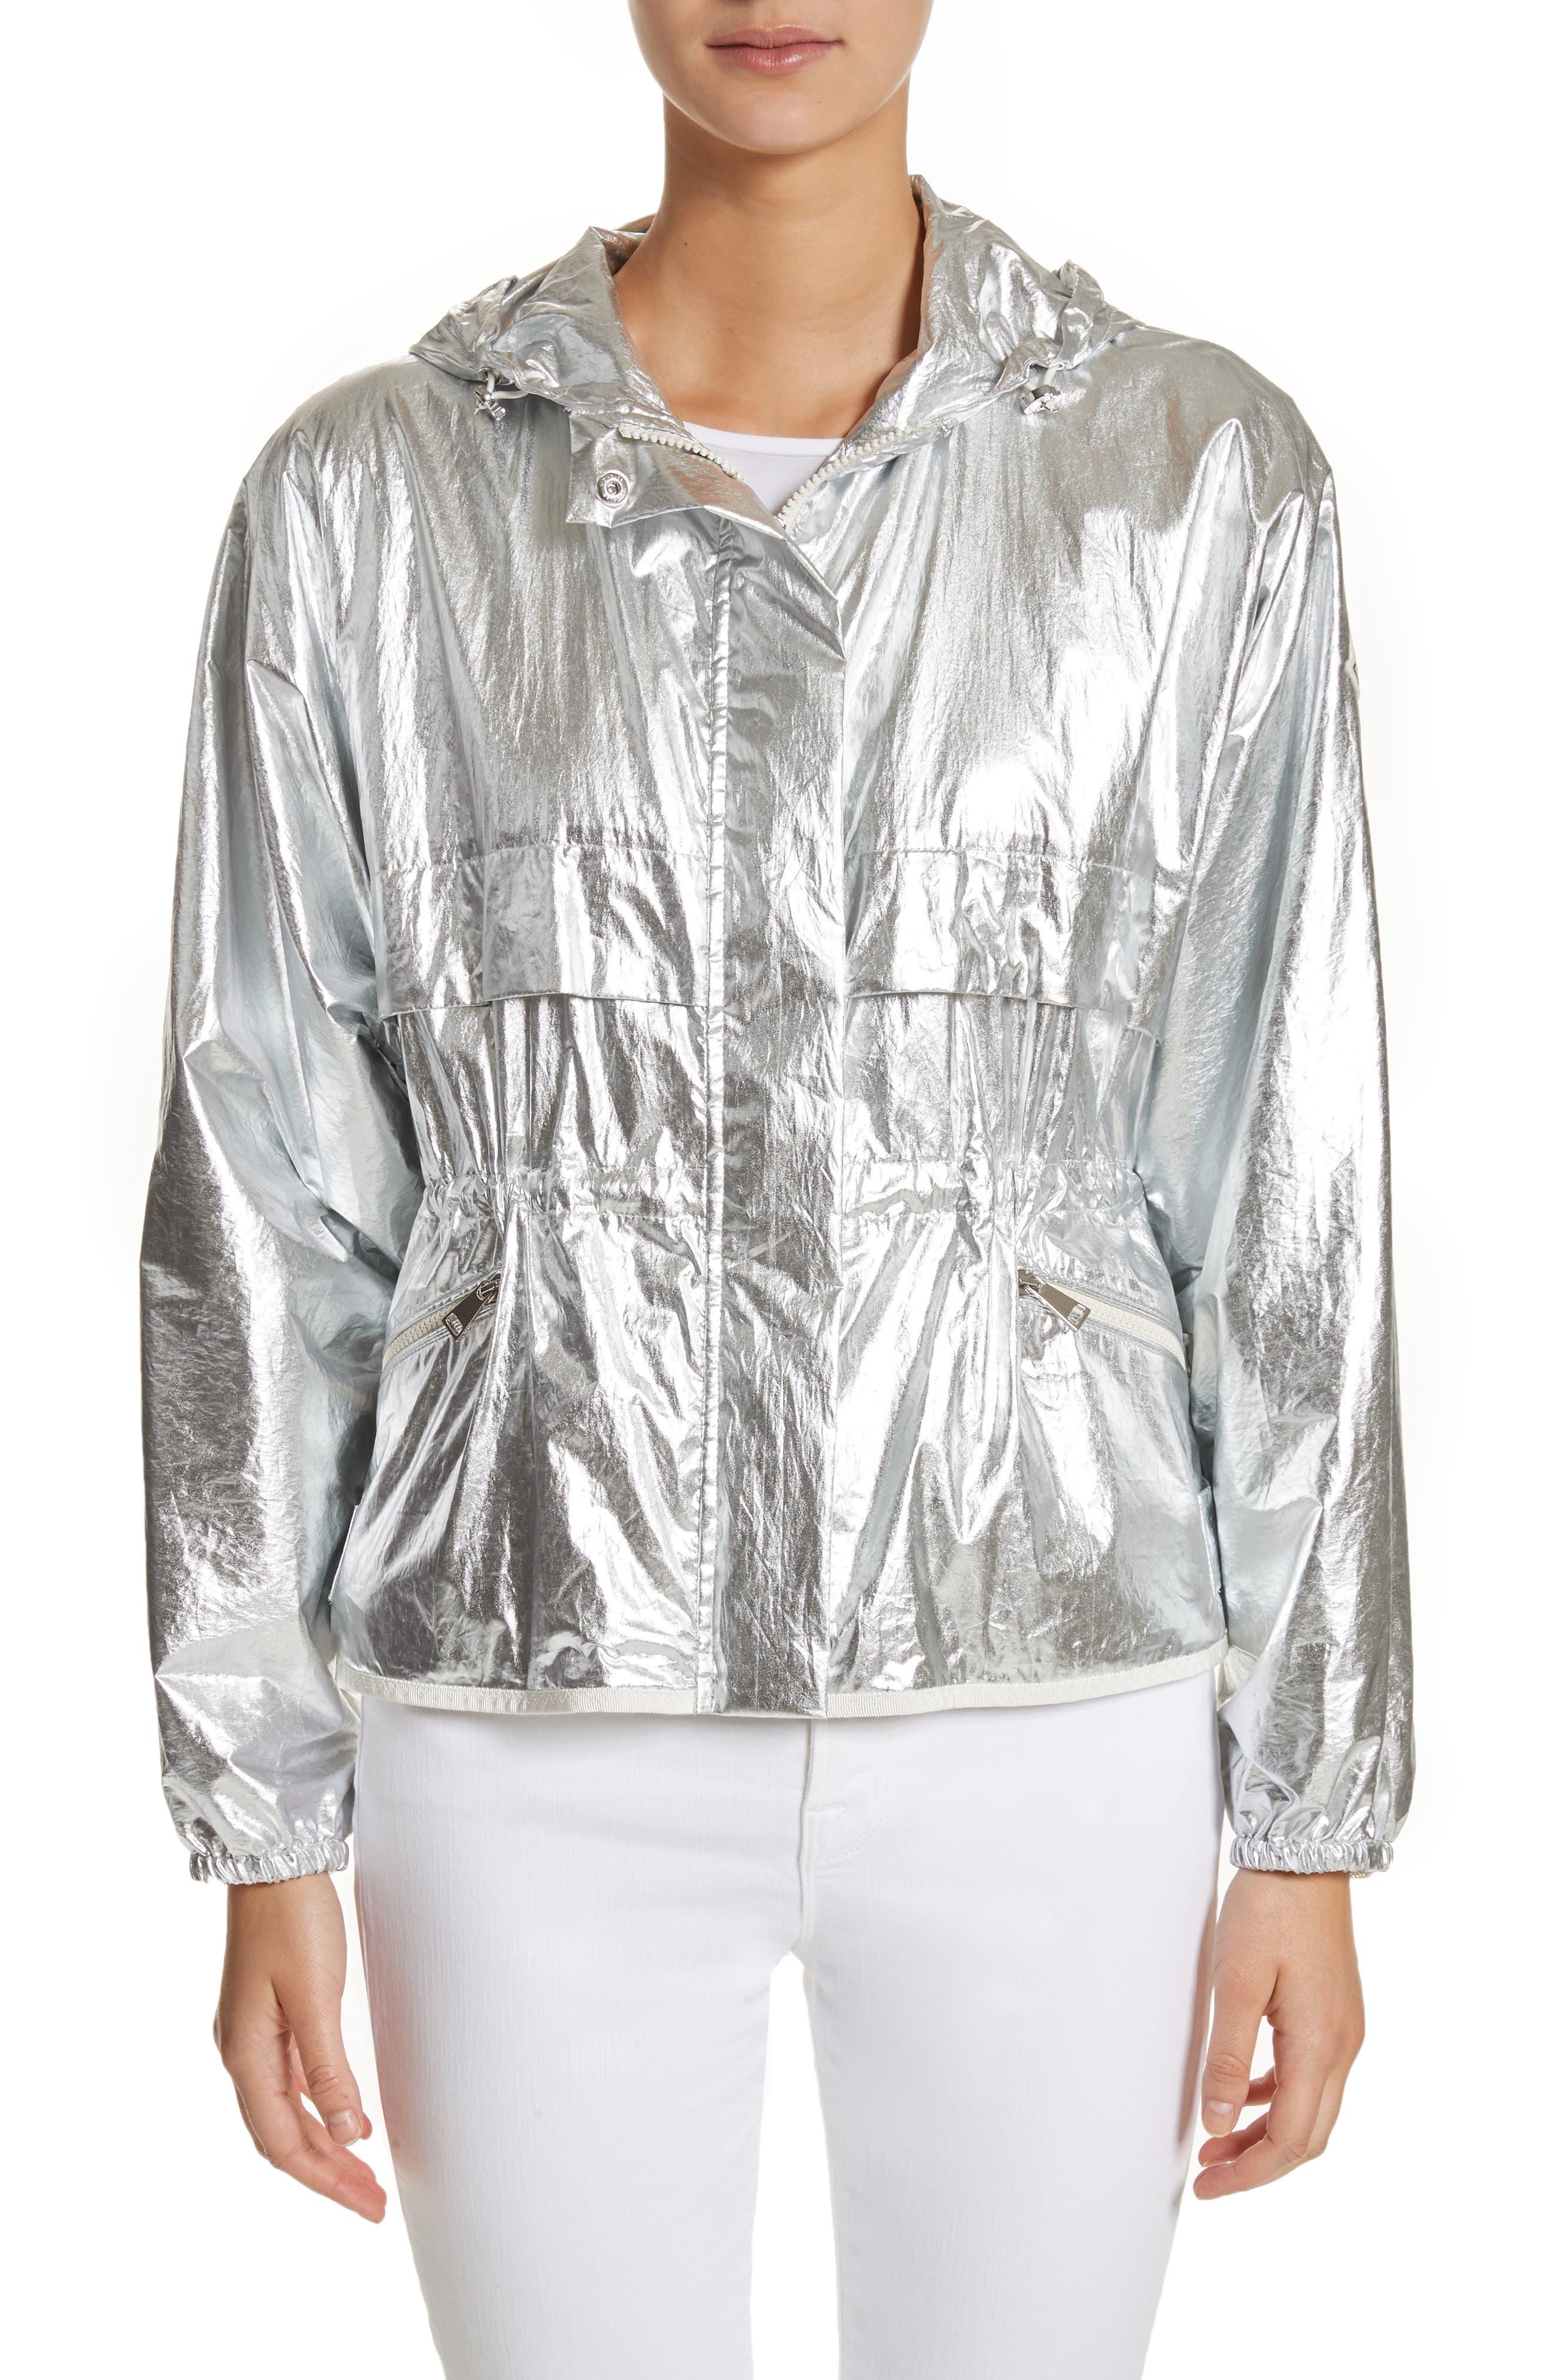 Alternate Image 1 Selected - Moncler Jais Metallic Hooded Raincoat